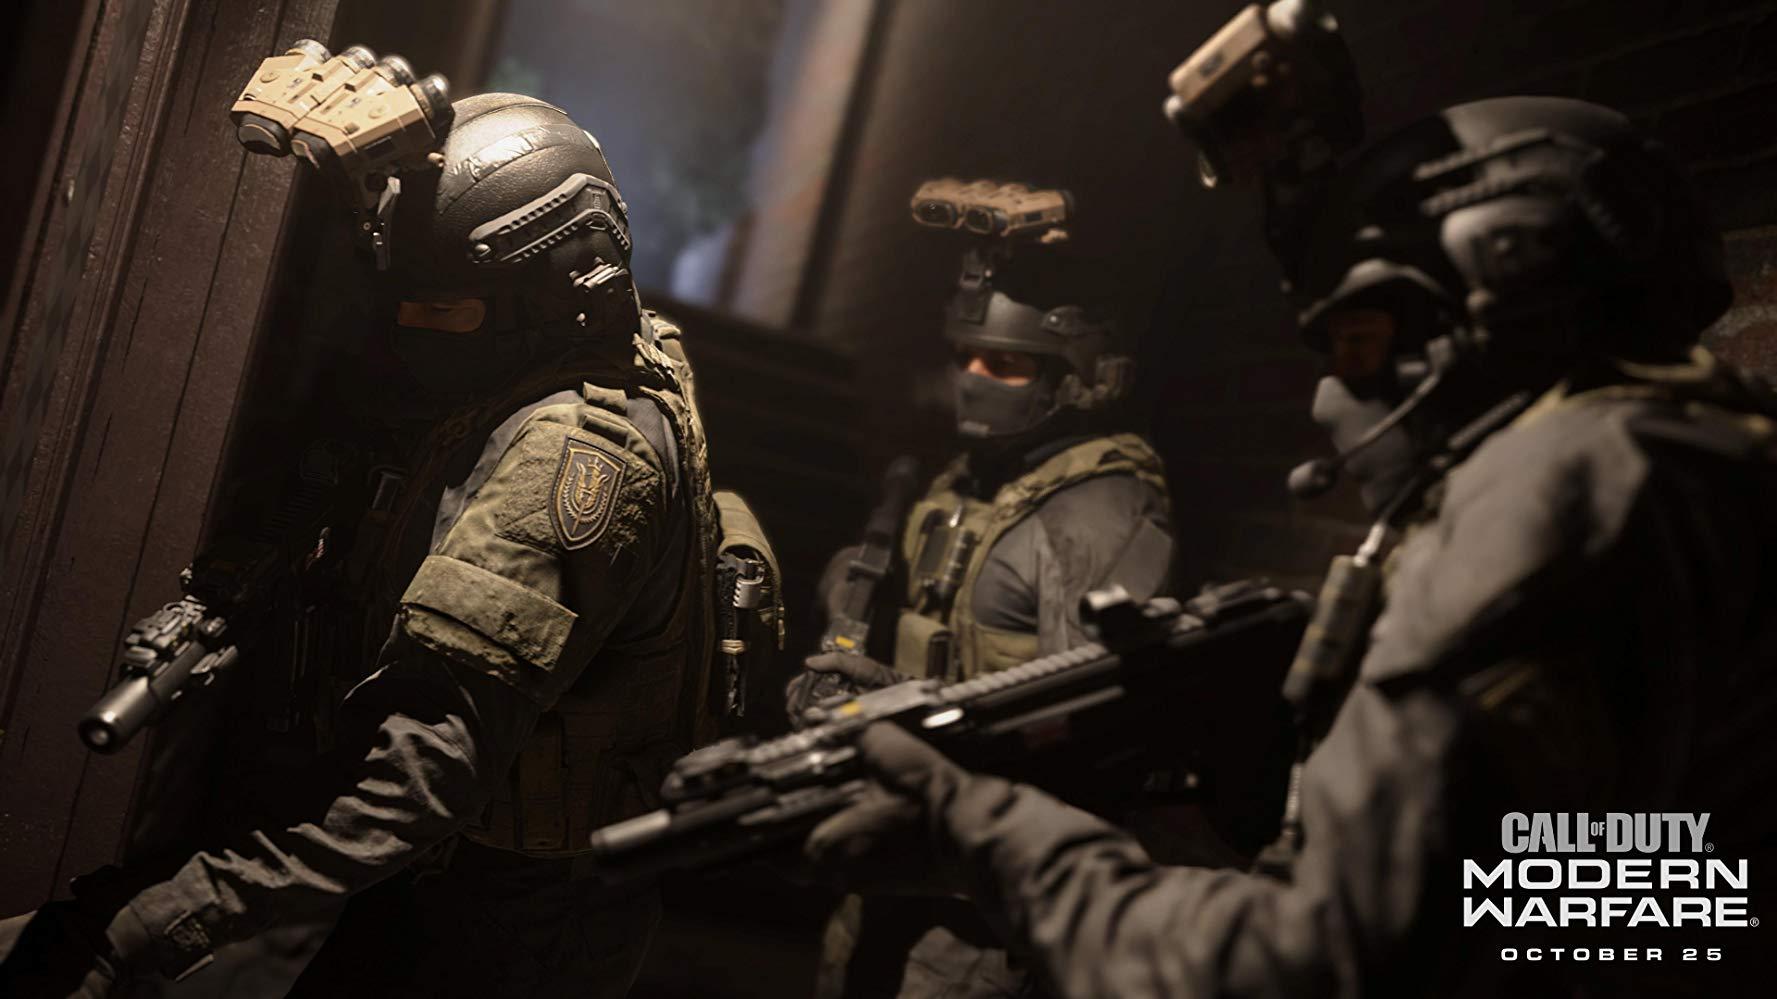 Call Of Duty Modern Warfare 2019 Call Of Duty Game Fans